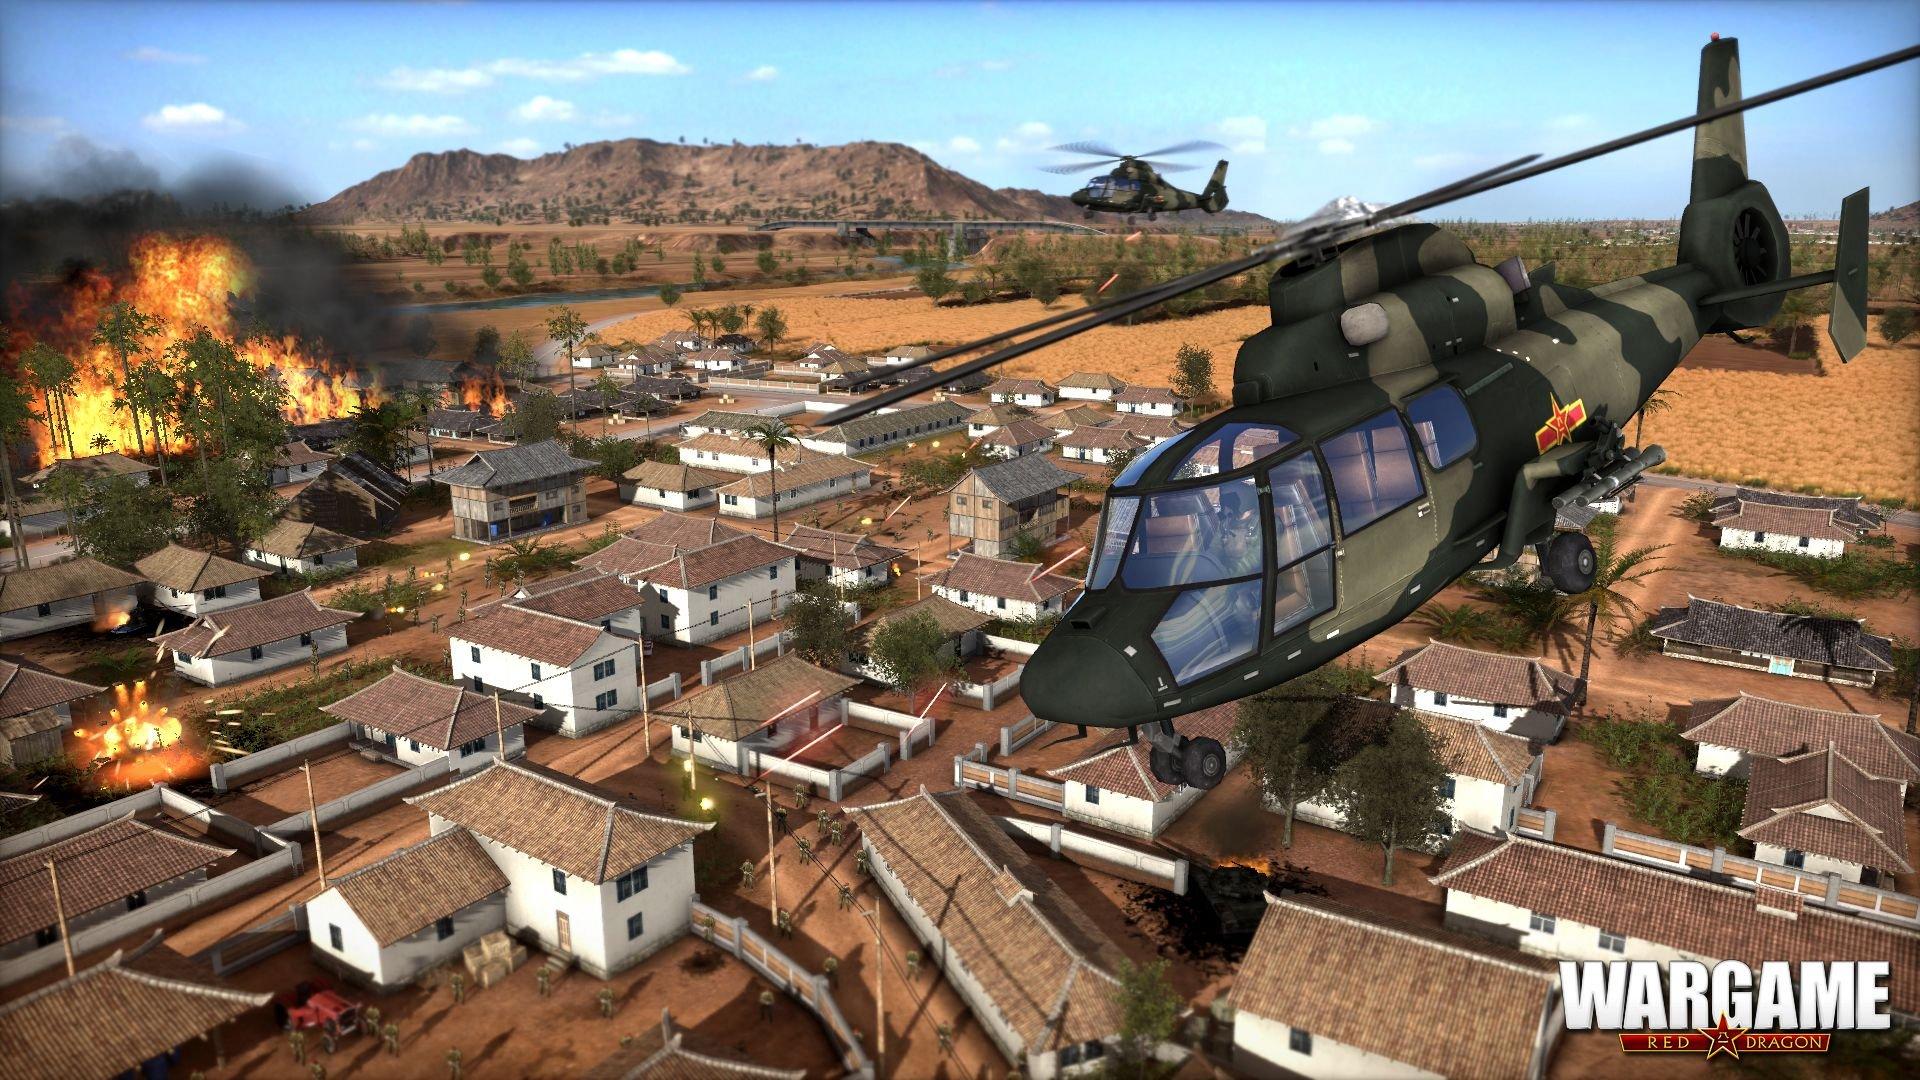 Wargame-RedDragon PC Editeur 005